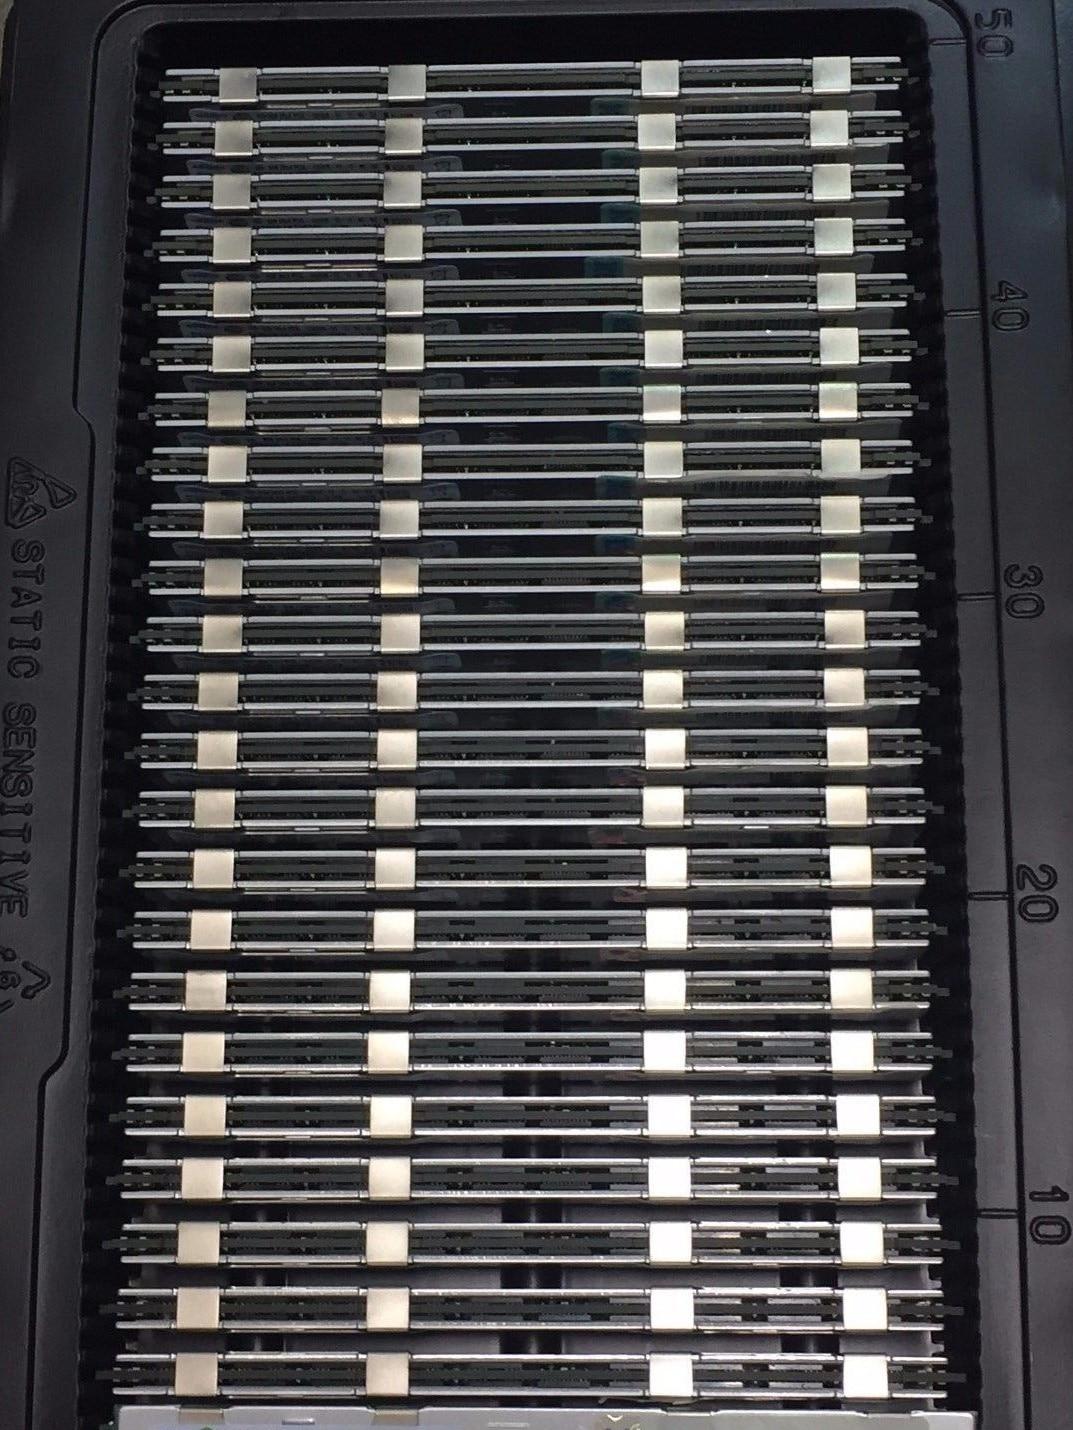 00D5048 46W0670 00D5047 16G DDR3 1866 ECC REG 1 year warranty 43x5318 46c0580 8g 1333 ecc reg server memory one year warranty